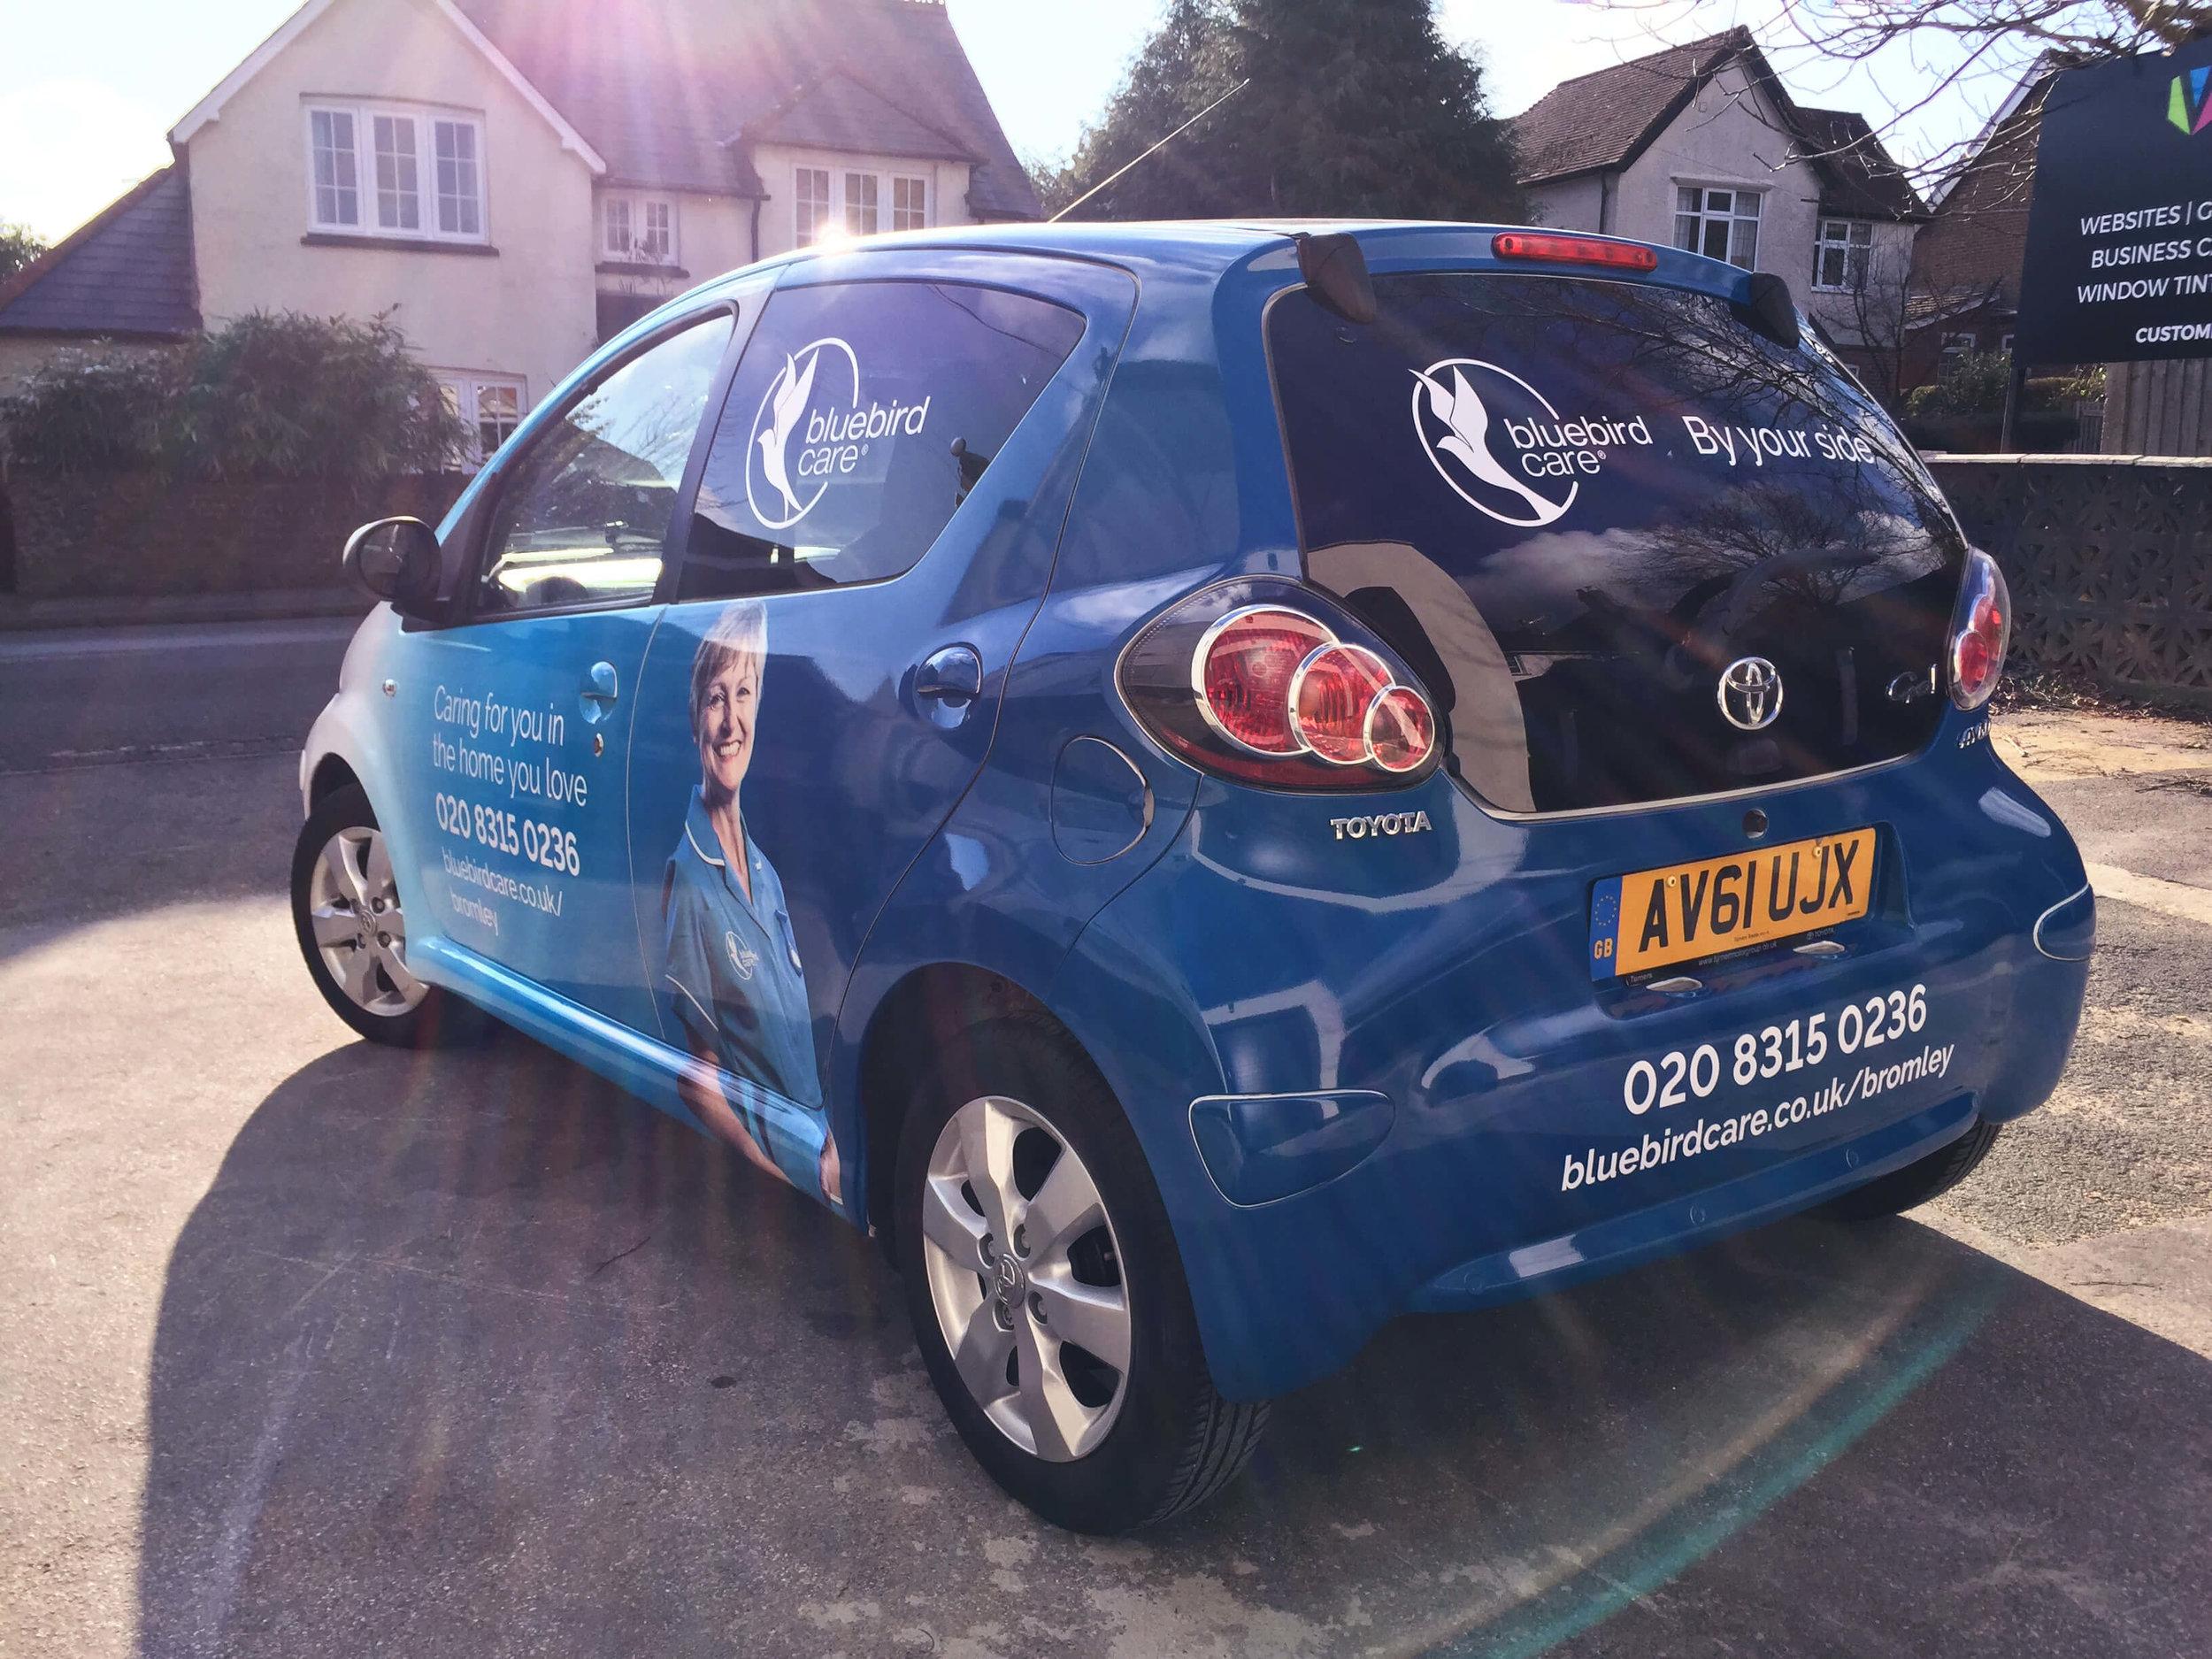 Bluebird Care Car Wrap